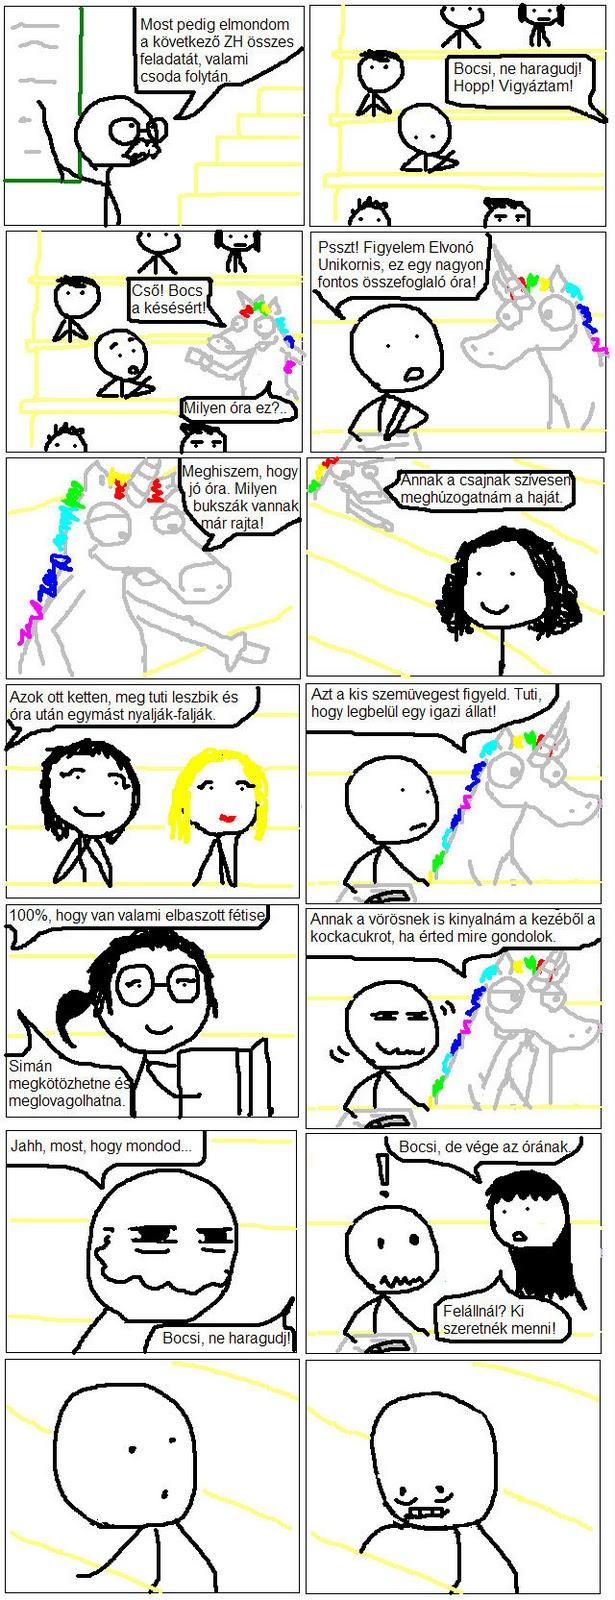 ijedt leszbikus szex